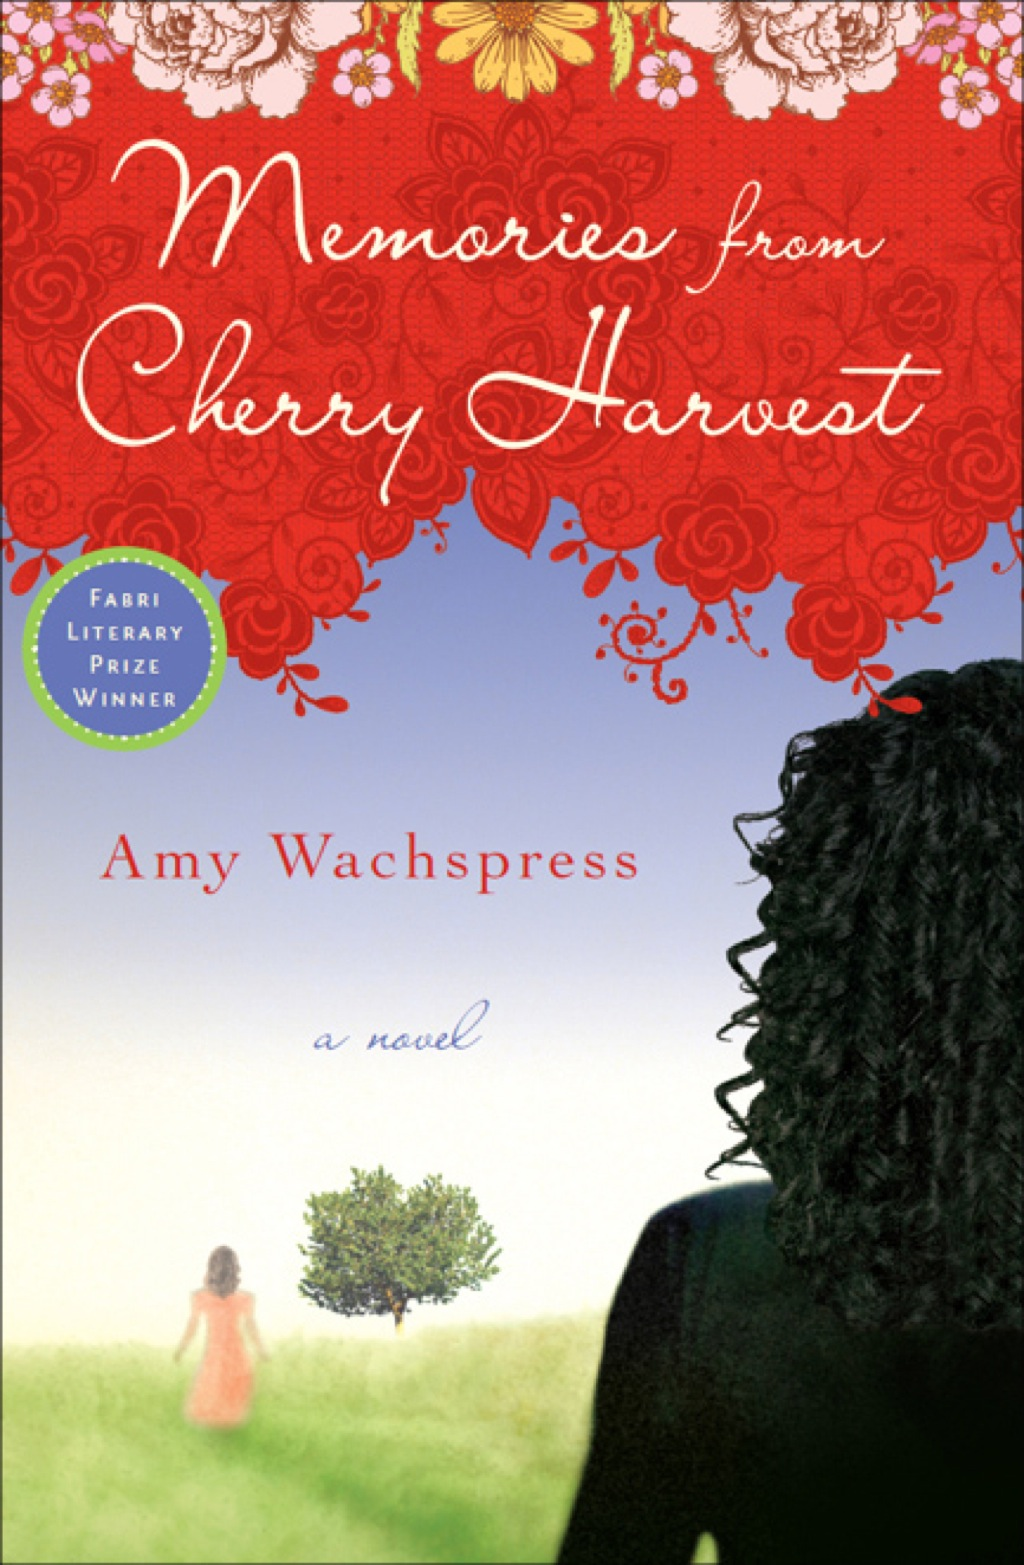 By Amy Wachspress PRINTISBN: 9781593764401 E-TEXT ISBN: 9781593764890 Edition: 0